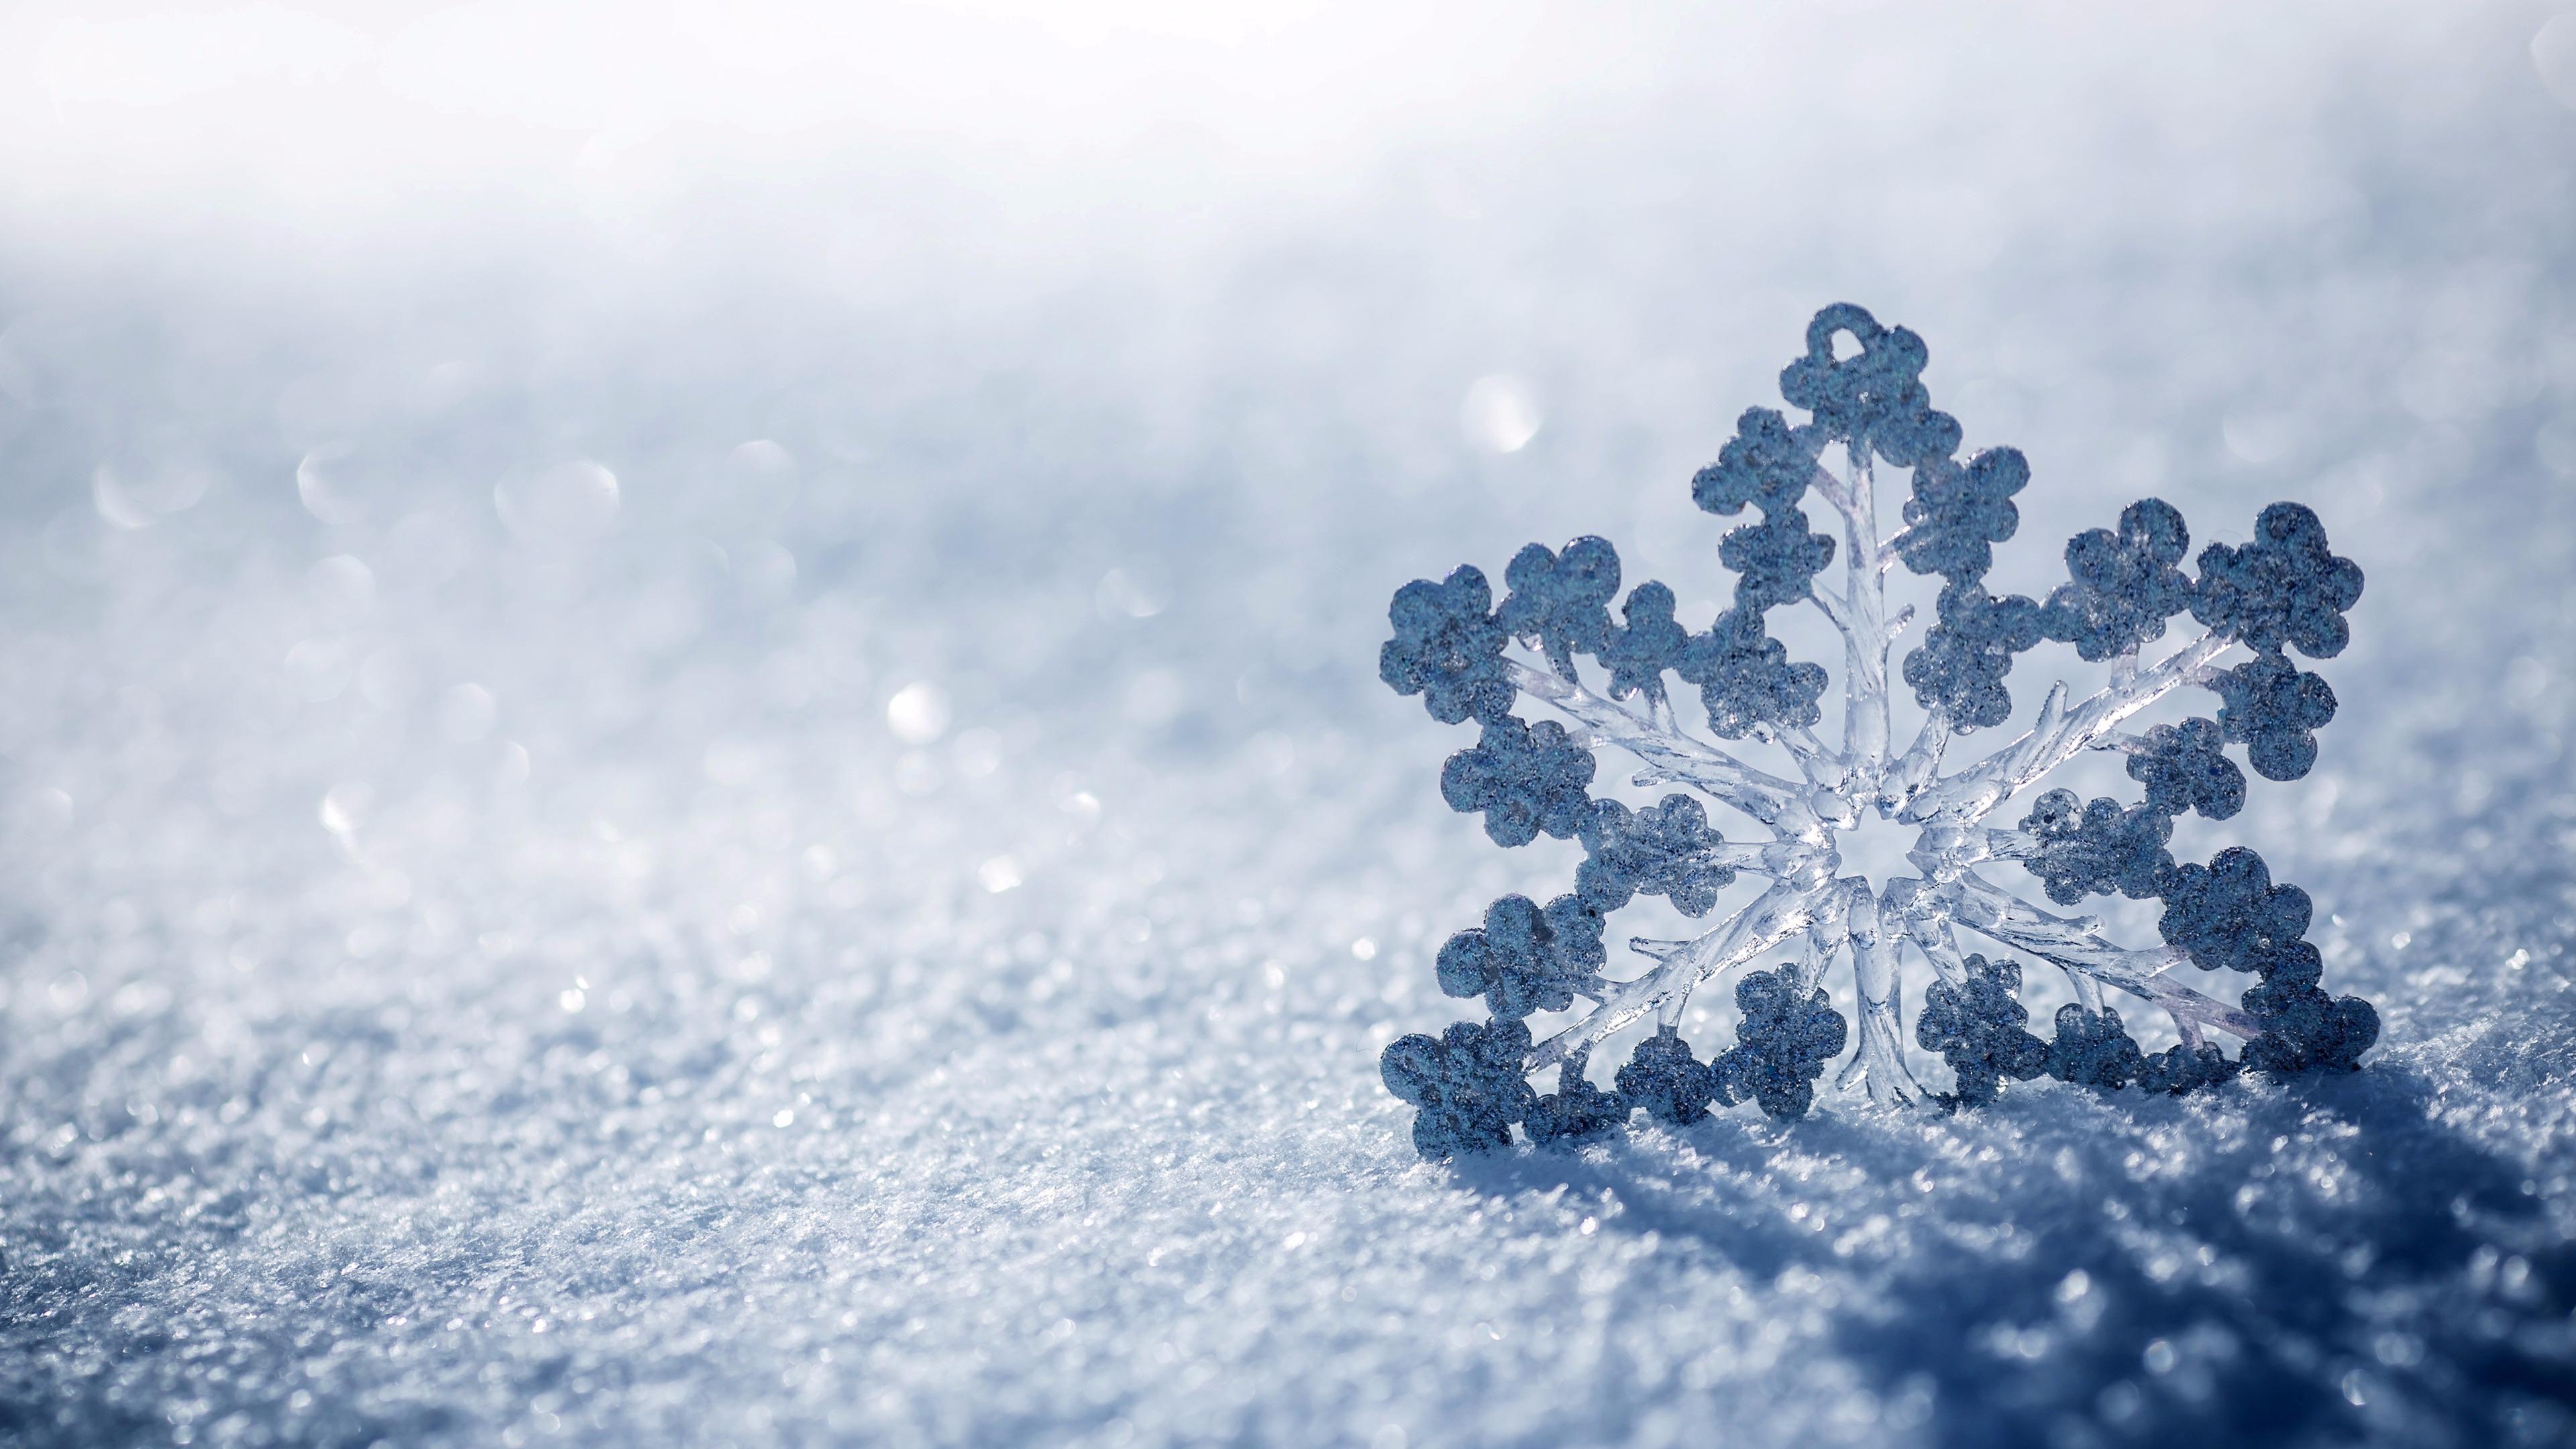 Snowflake In The Snow K Ultrahd Wallpaper Wallpaper Studio  Tens Of Thousands Hd